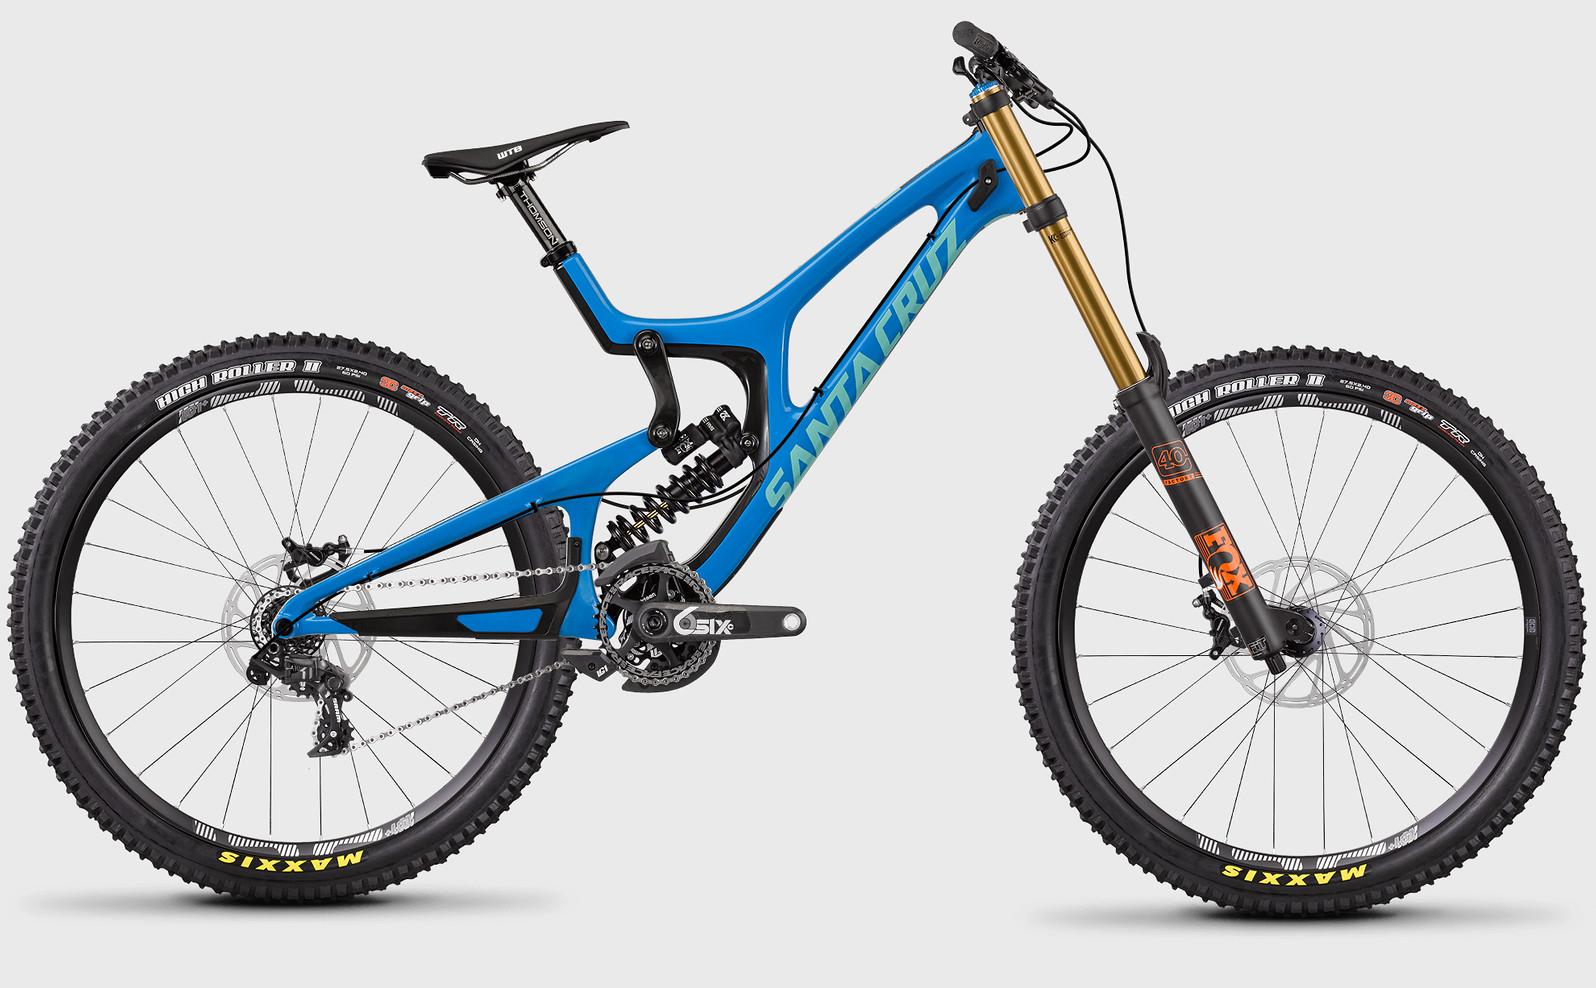 2017 Santa Cruz V10 Carbon Cc X01 Bike Reviews